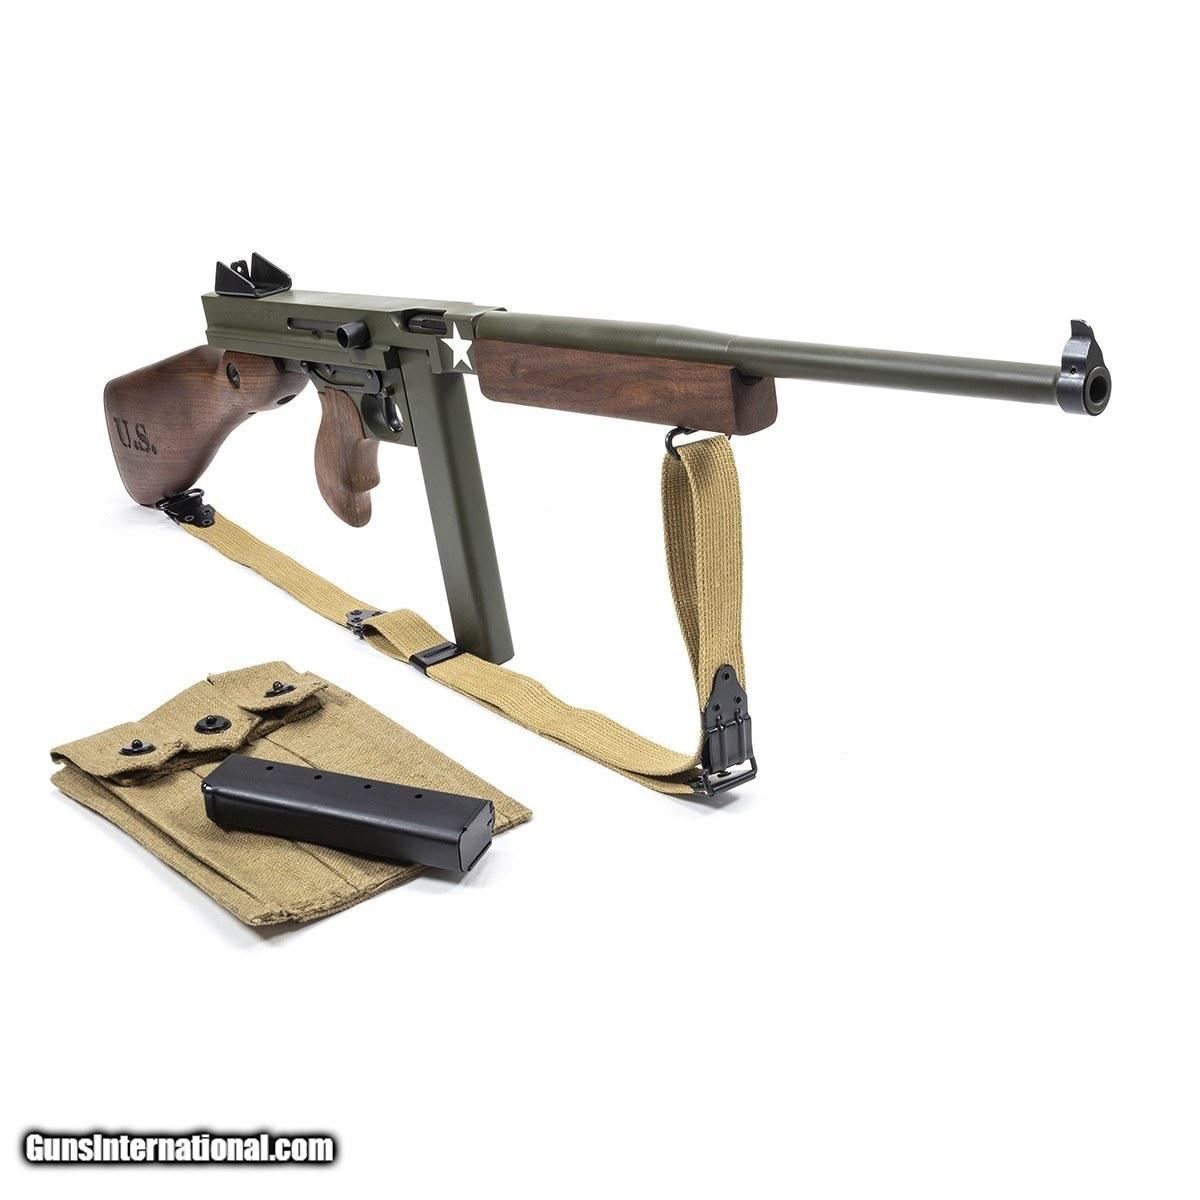 Auto-Ordnance Tanker WWII Thompson M1 Carbine  45 ACP TM1C1 for sale